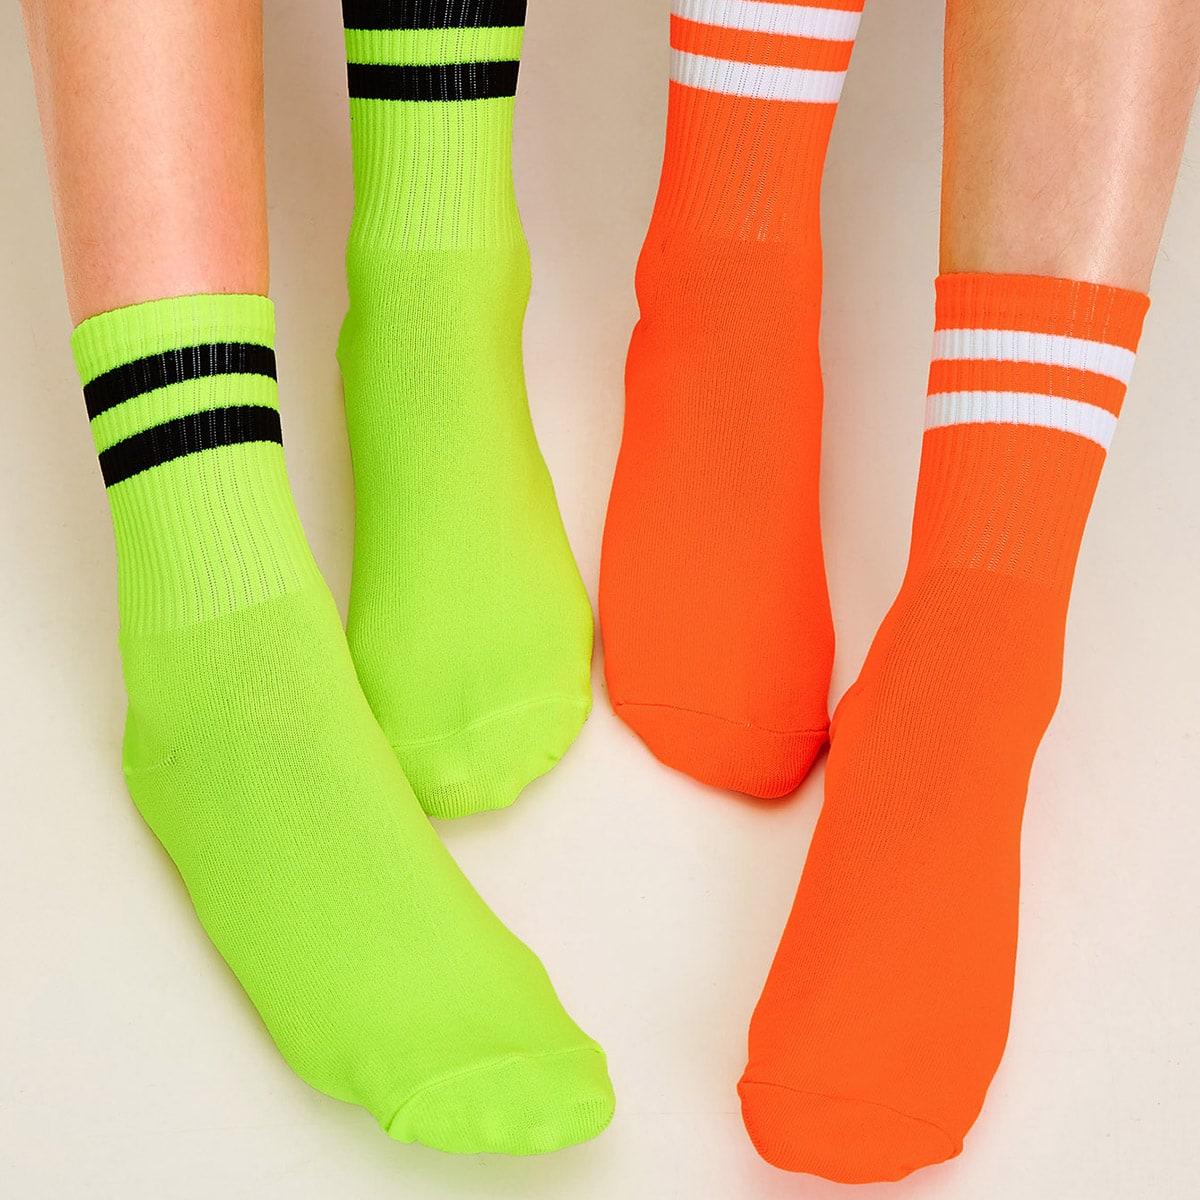 SHEIN coupon: Striped Pattern Socks 2pairs